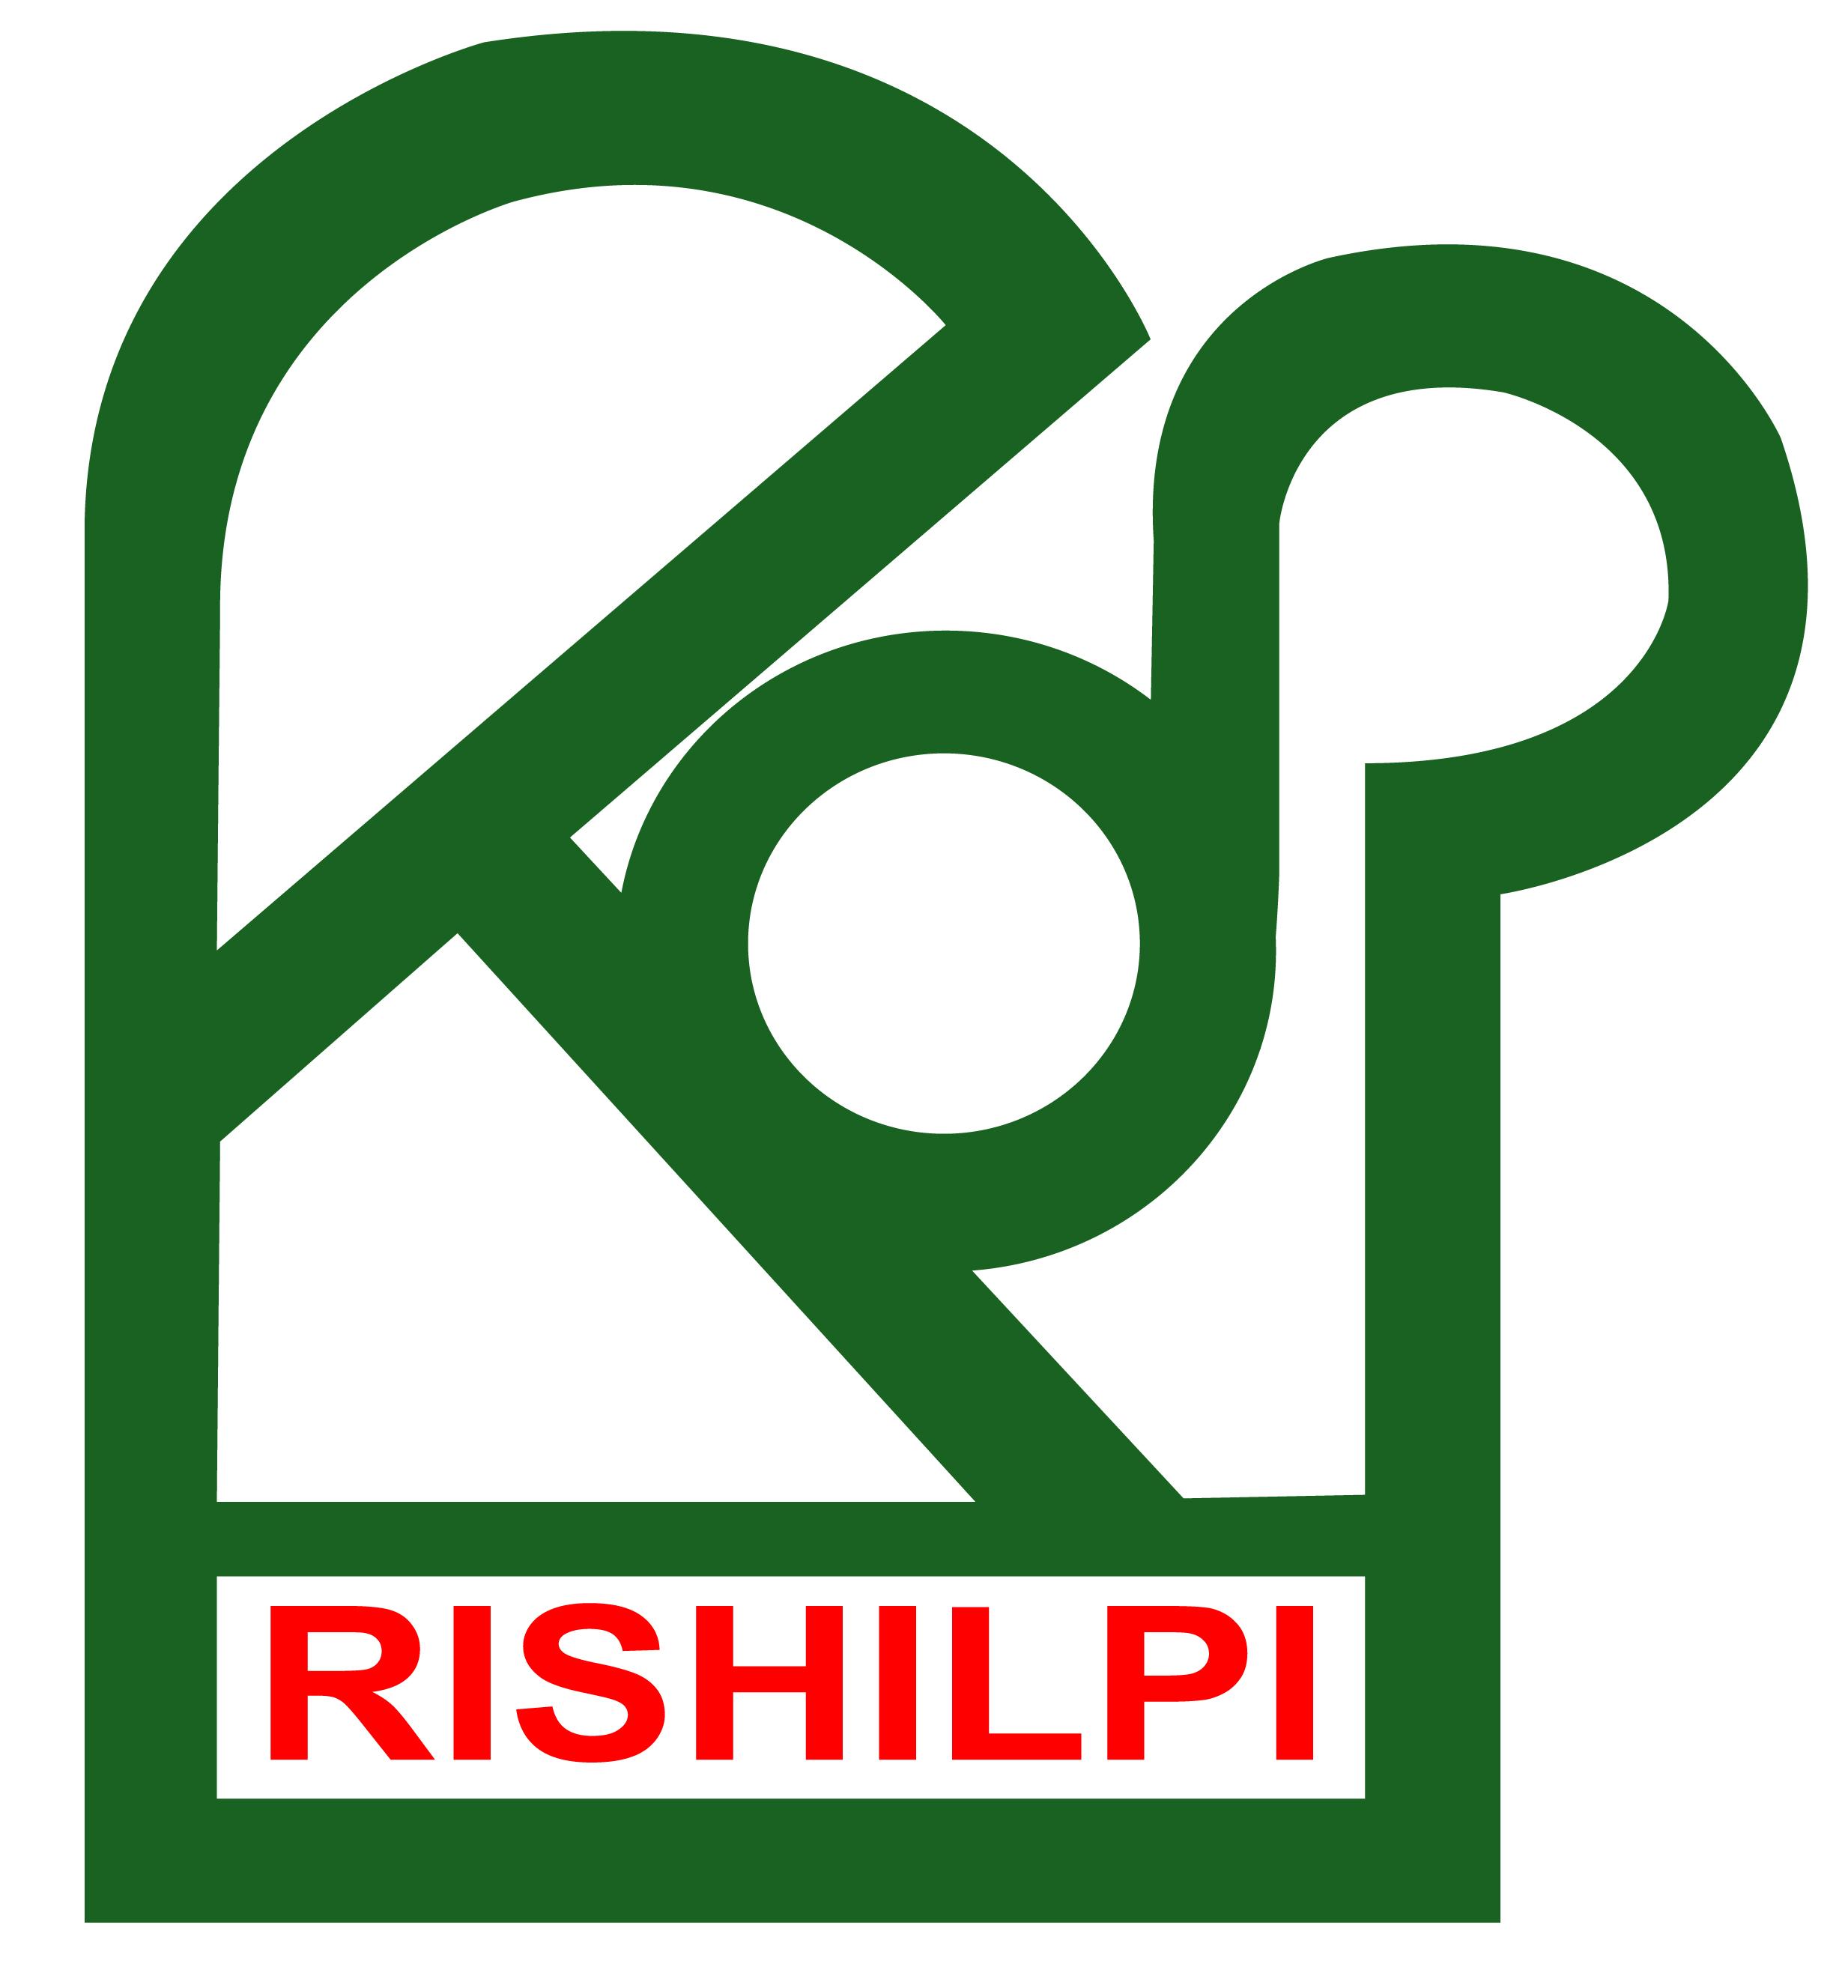 PROGETTO UOMO RISHILPI INTERNATIONAL ONLUS